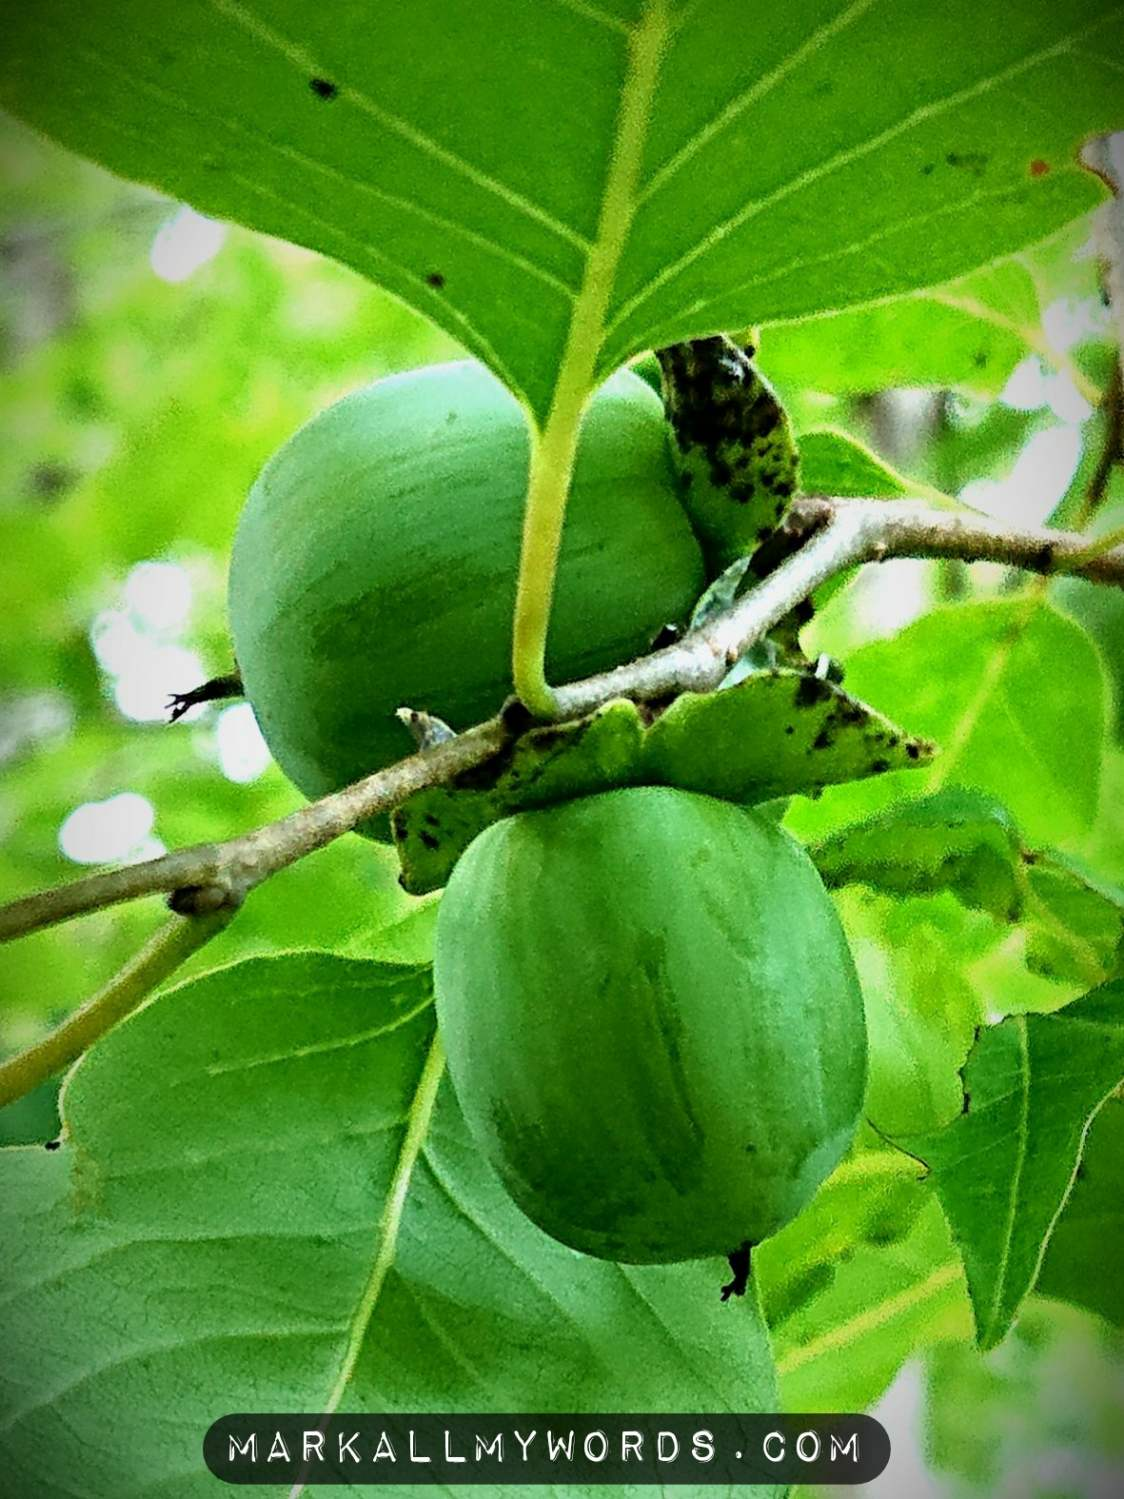 Unripe eastern persimmon fruit